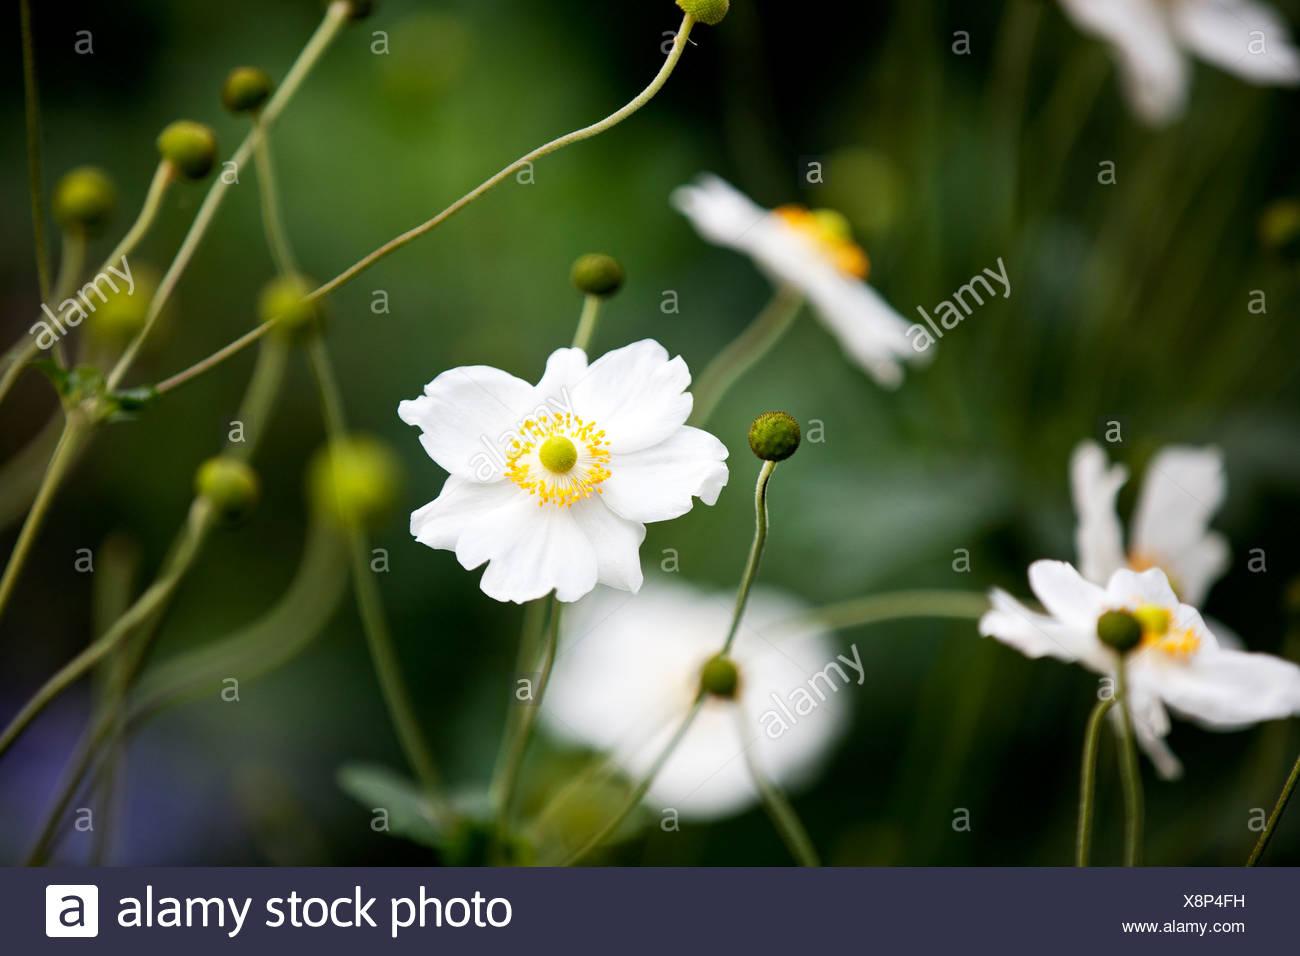 White flowers yellow center stock photos white flowers yellow white japanese anemone flowers stock image mightylinksfo Gallery